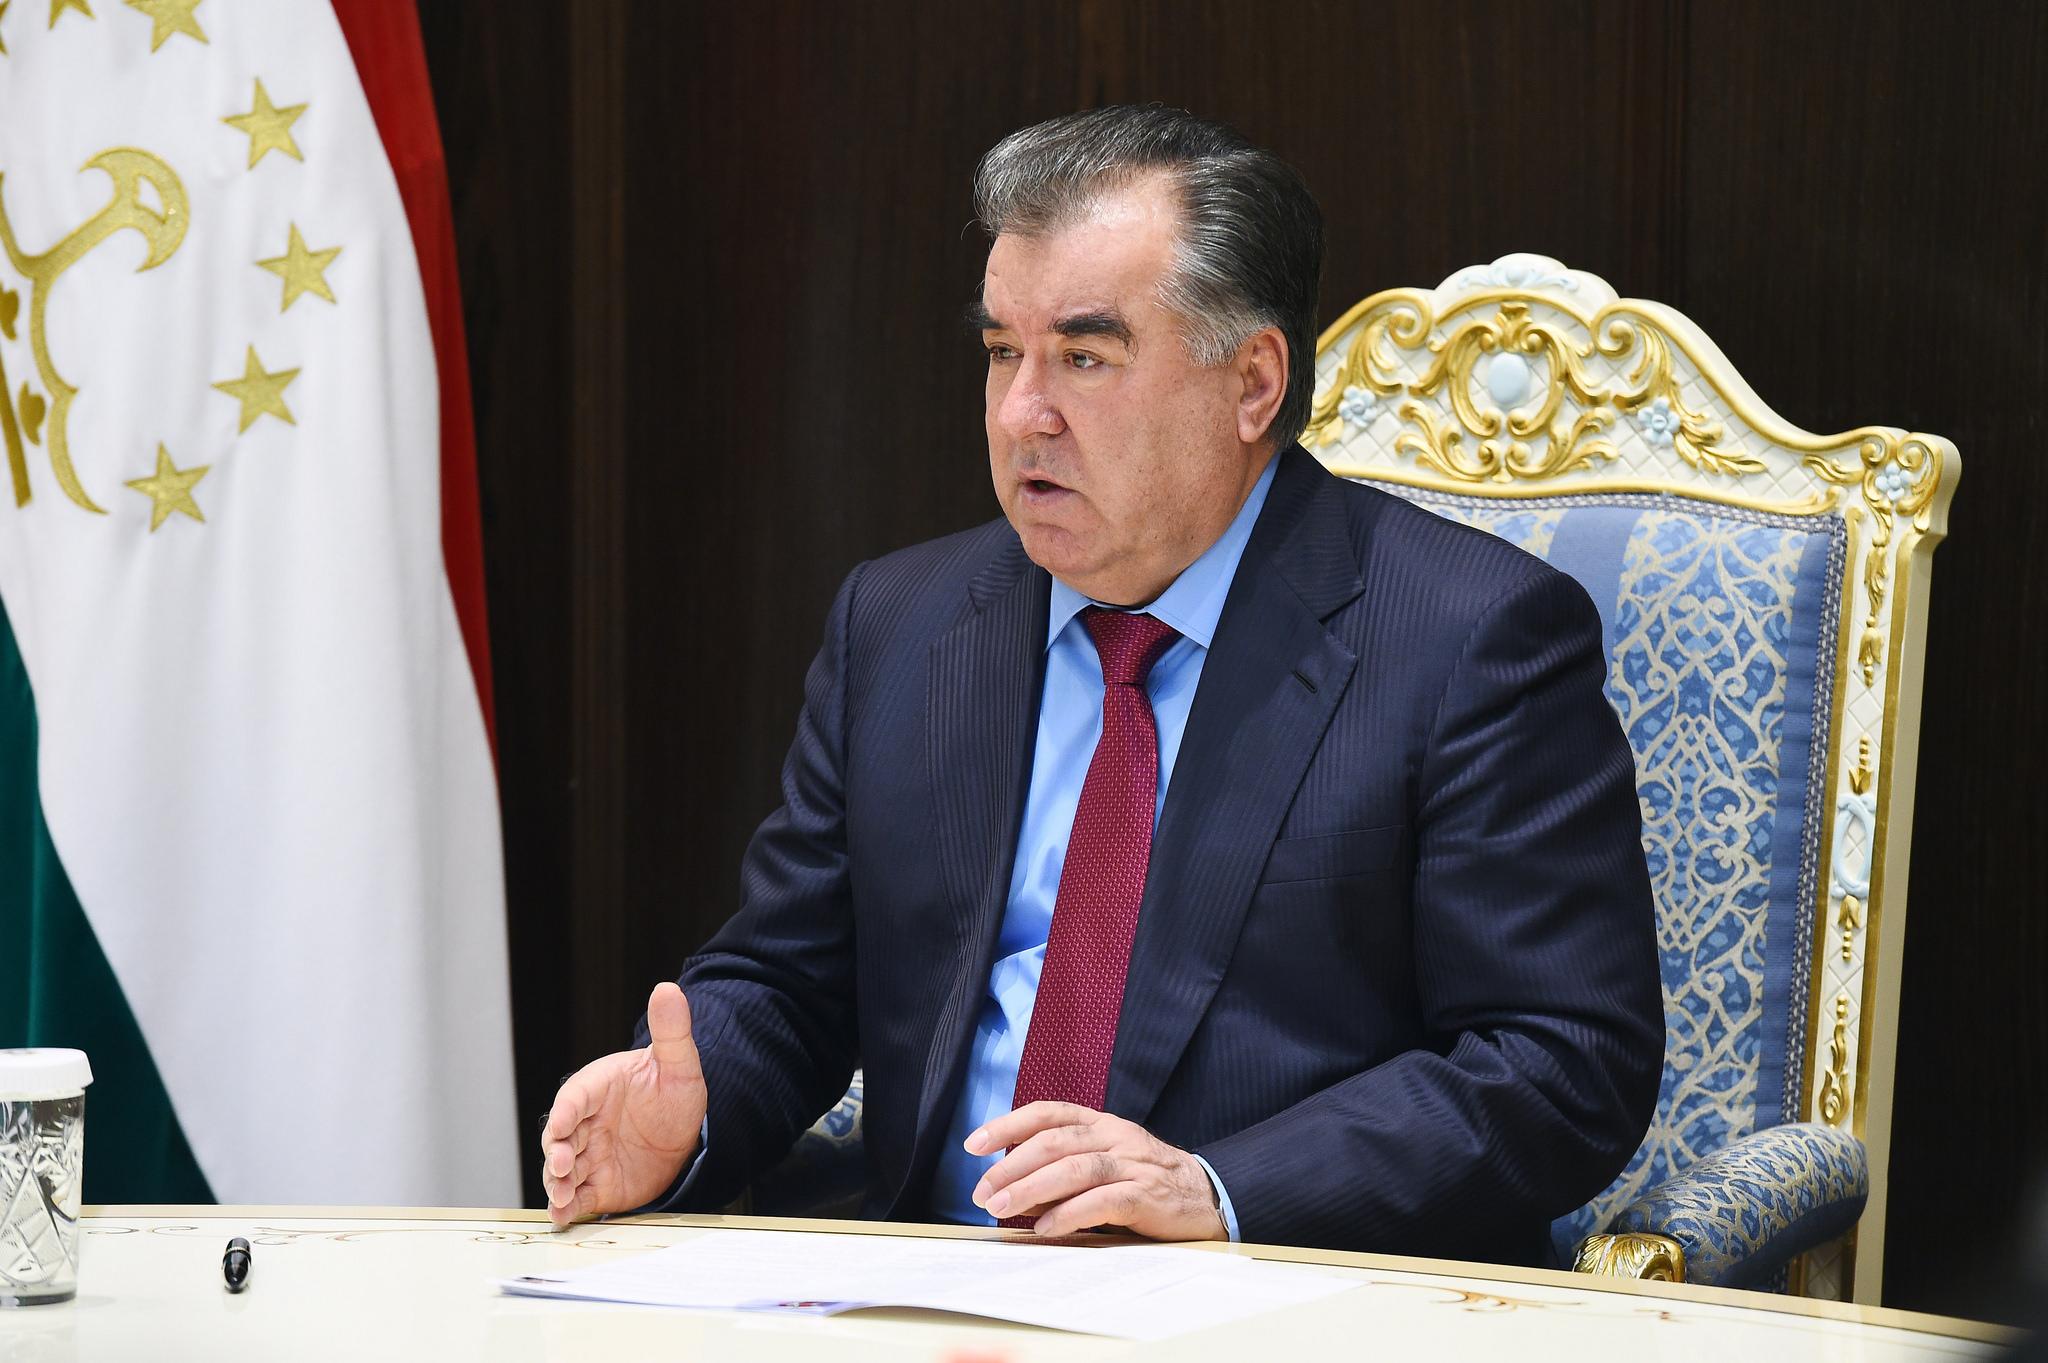 Emomalii Rahmon Président Tadjikistan